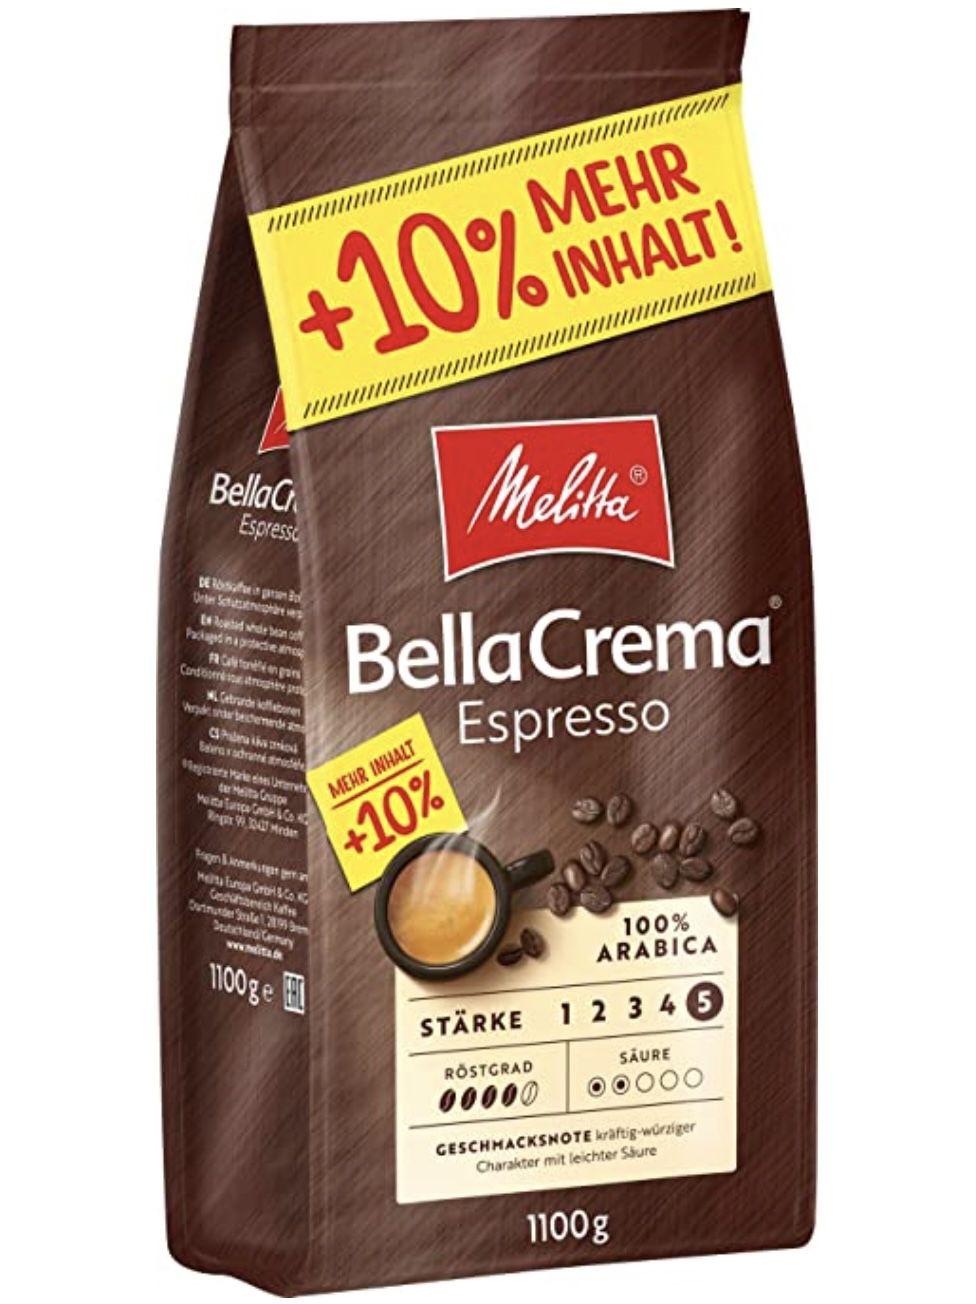 5x 1,1kg Melitta BellaCrema ganze Bohne ab 45,46€ (statt 55€)